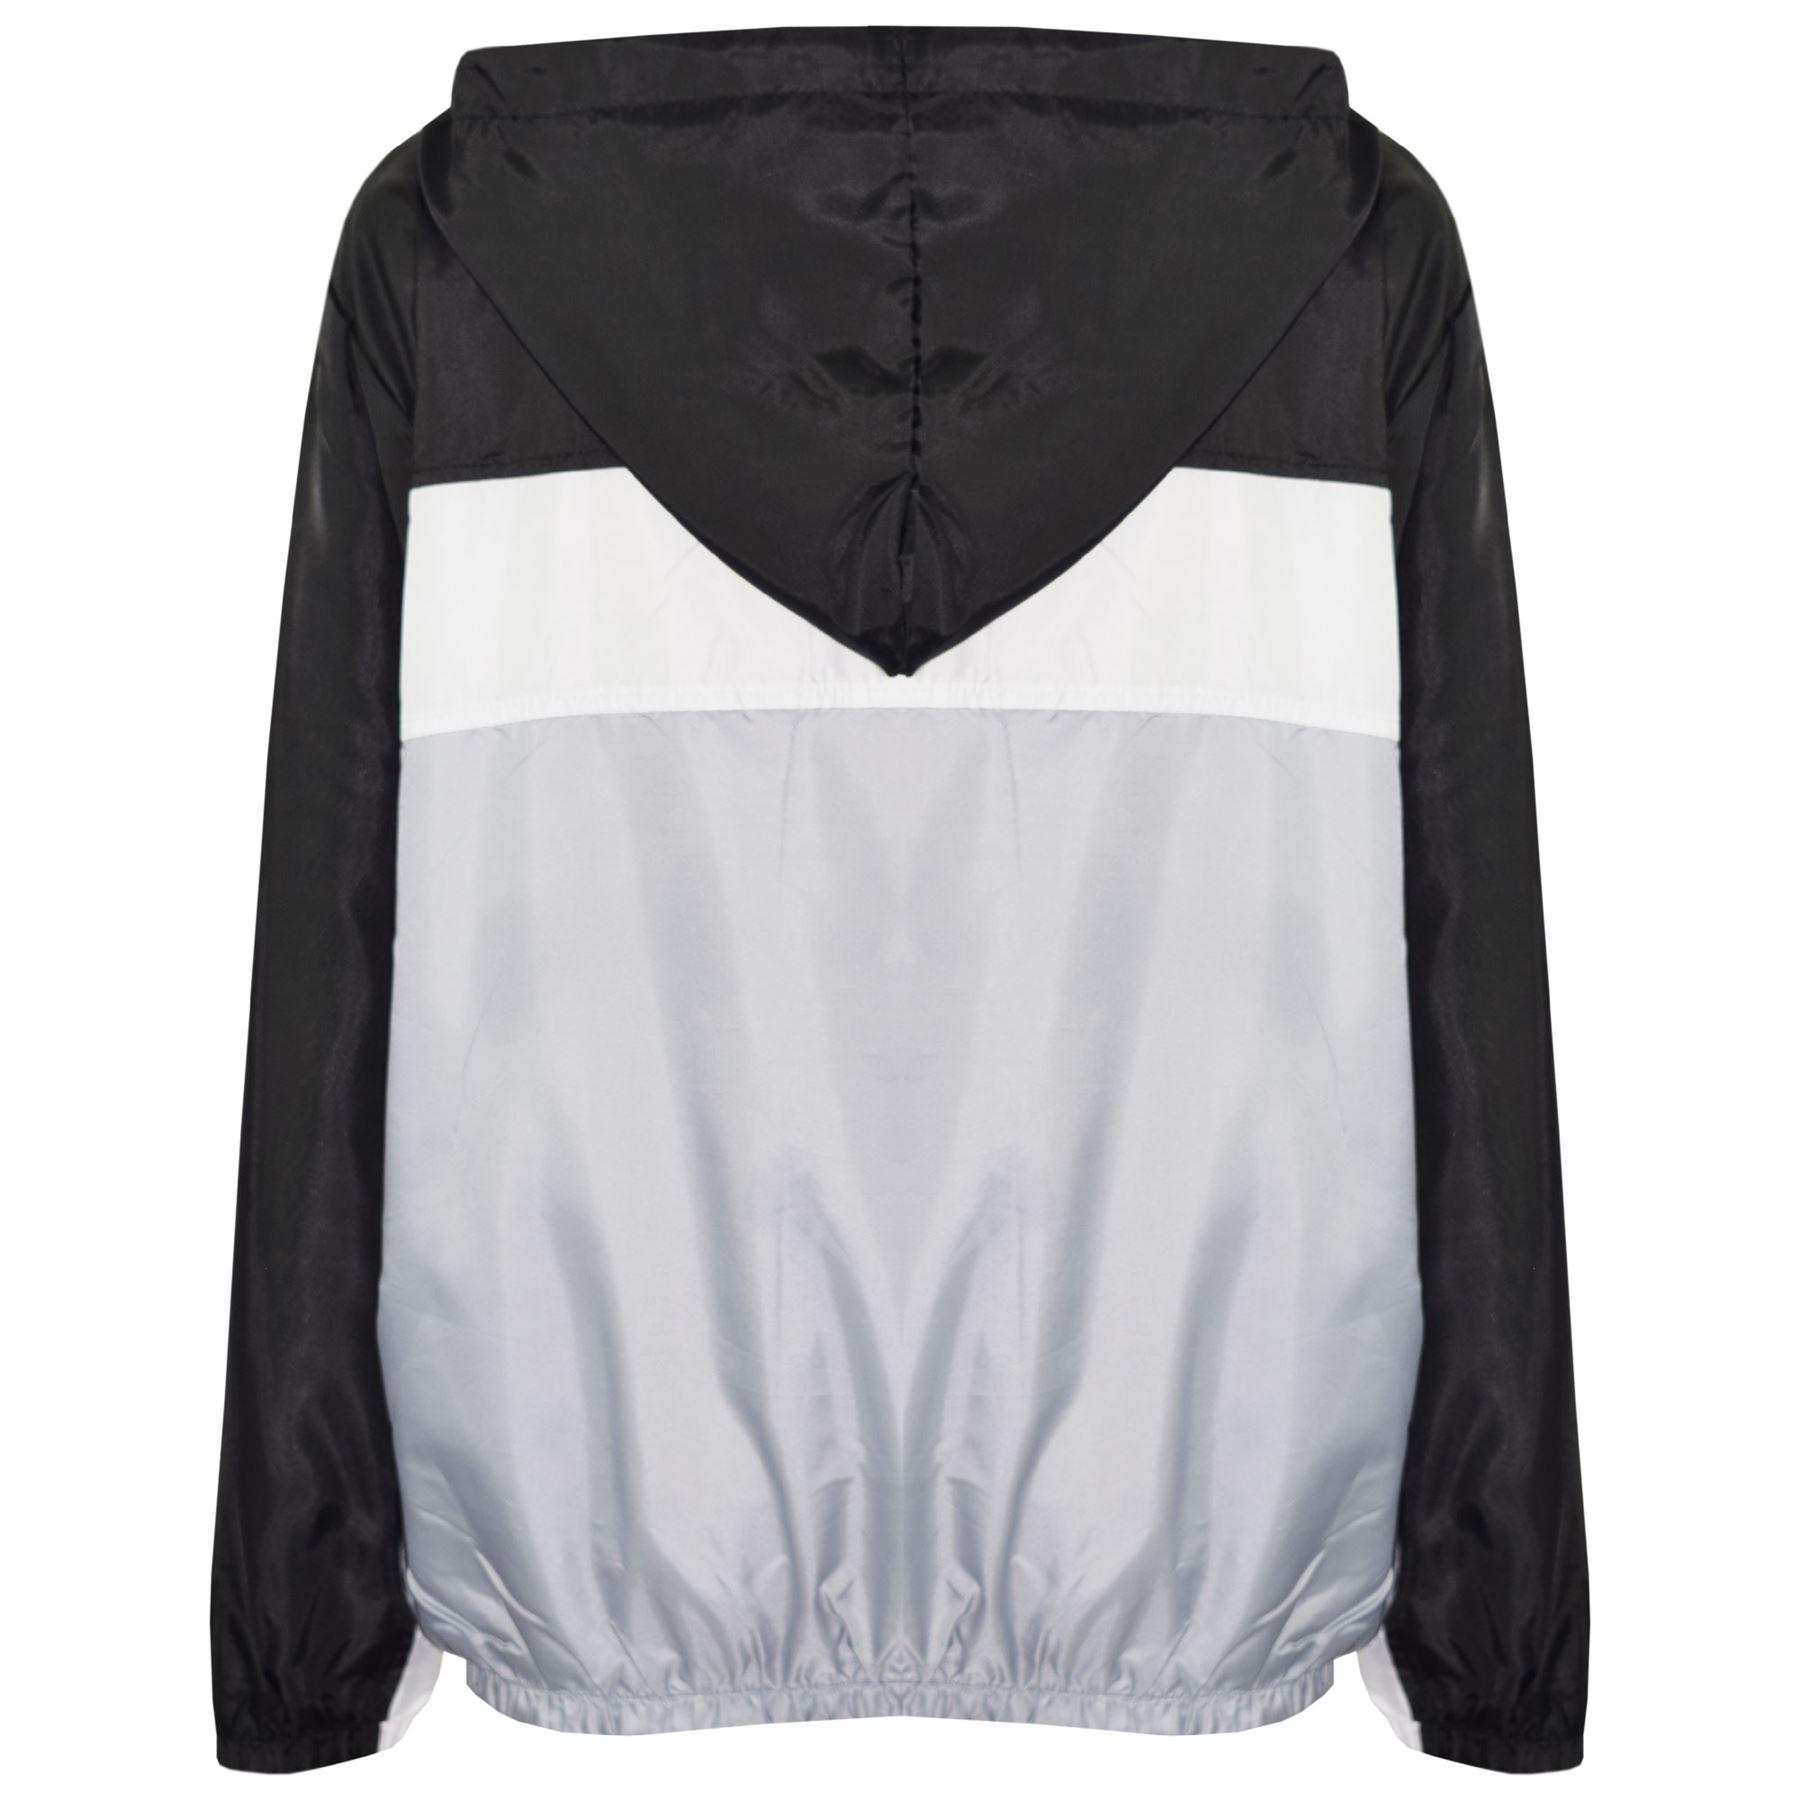 Kids-Boys-Girls-Windbreaker-Contrast-Block-Hooded-Jackets-Rain-Mac-Raincoat-5-13 thumbnail 6